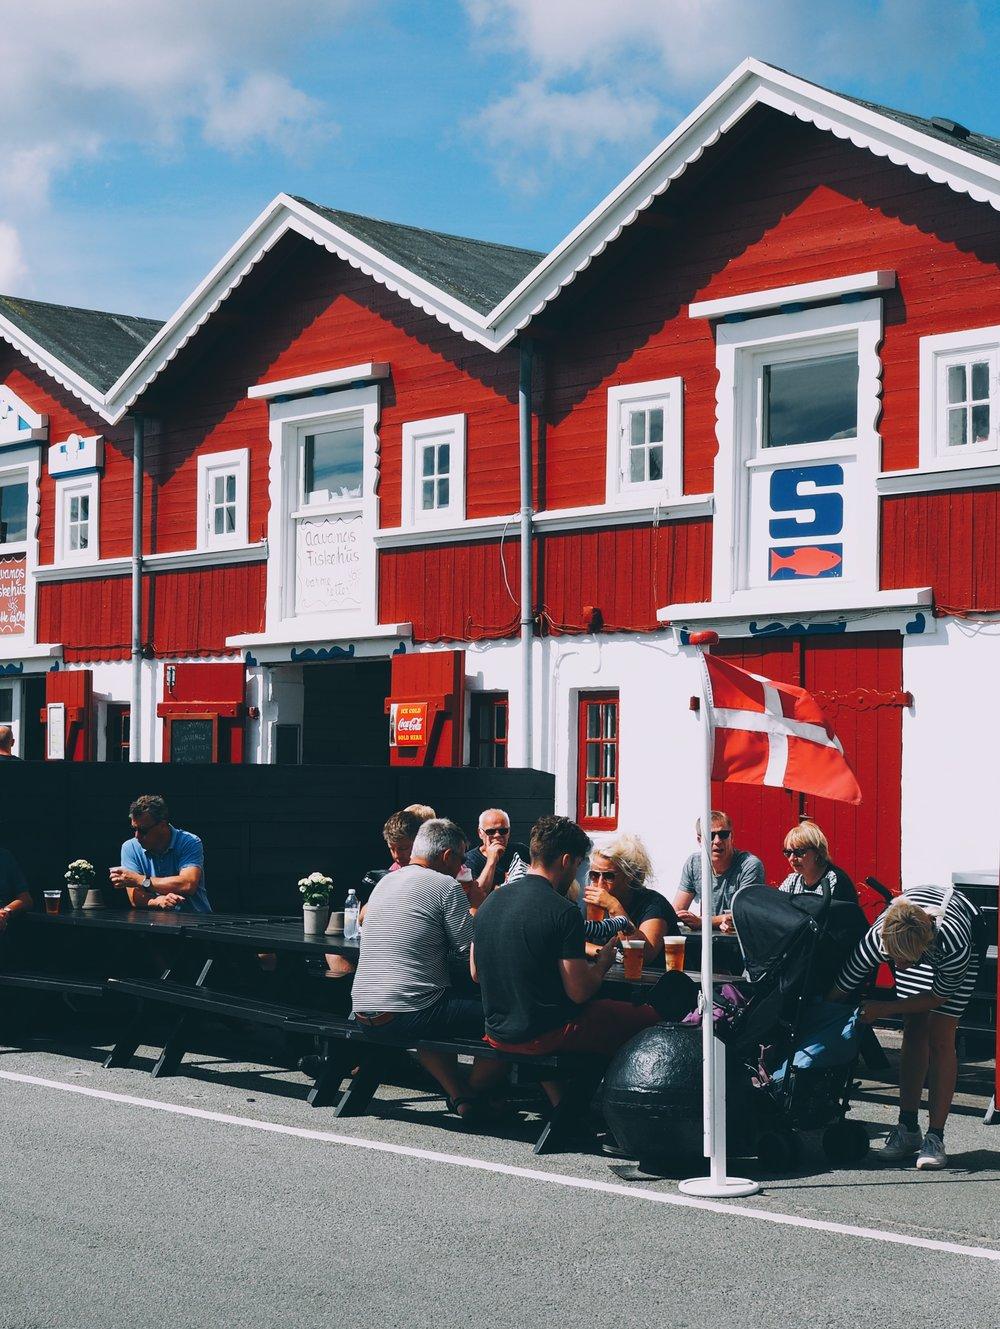 Fiskehus Skagen